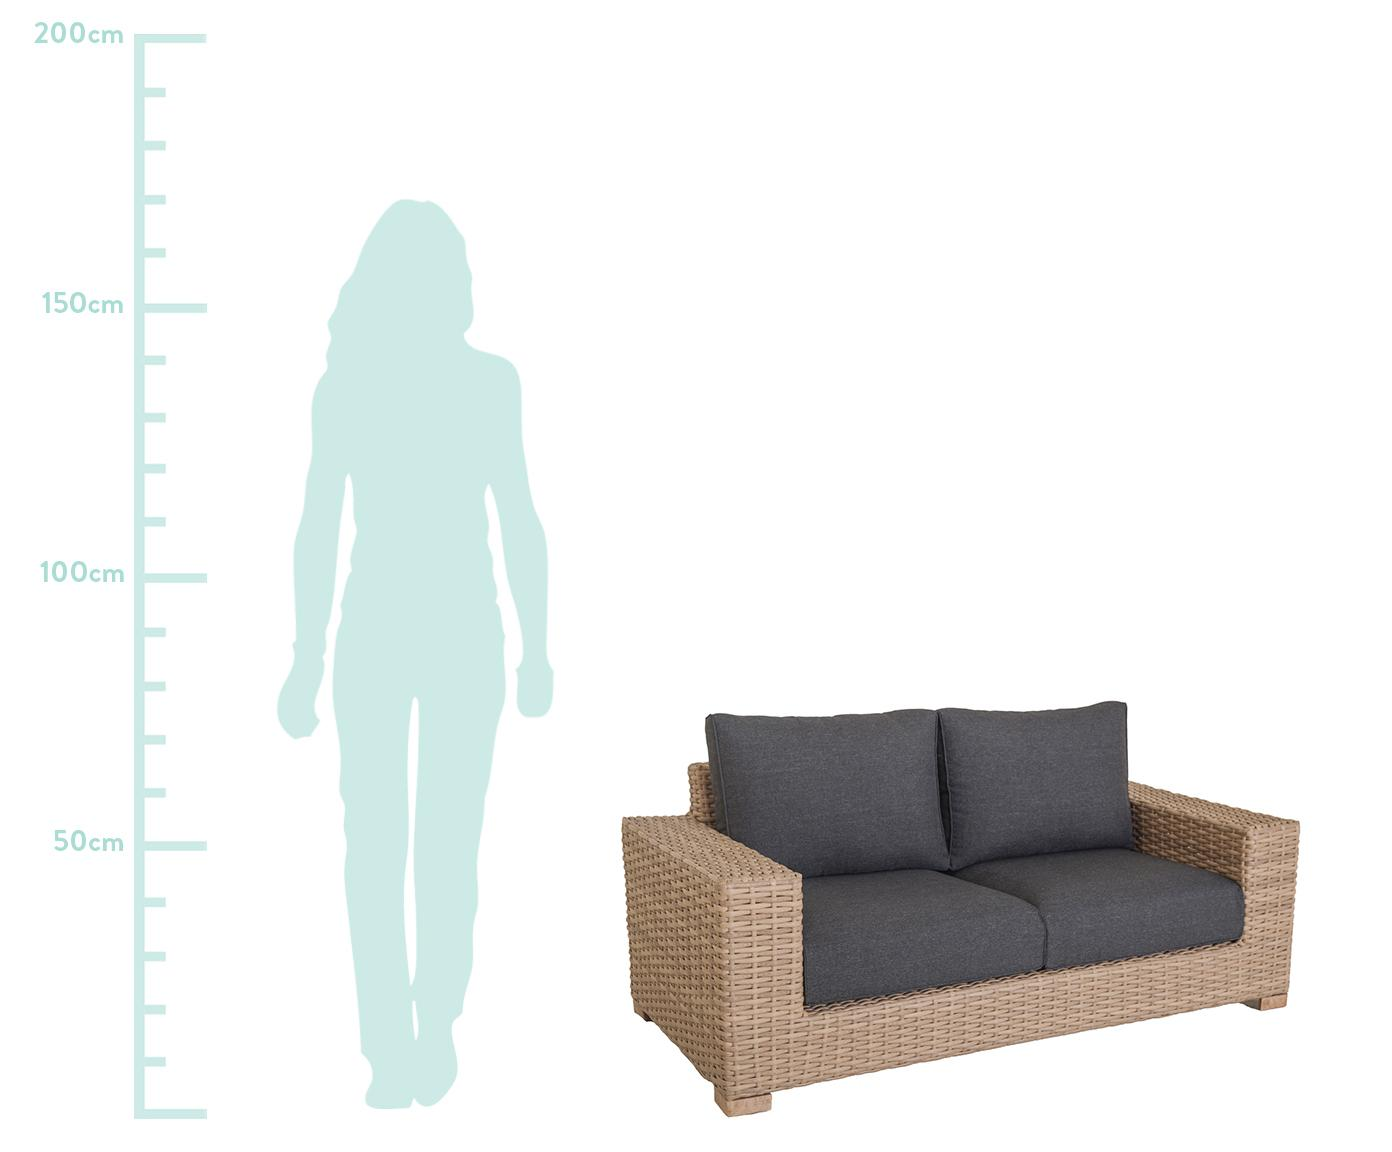 Garten-Loungesofa Saba aus Polyratten (2-Sitzer), Korpus: Polyrattan, UV-beständig, Füße: Akazienholz, massiv, Gestell: Aluminium, Bezug: Polyester, UV-beständig u, Braun, B 180 x T 88 cm